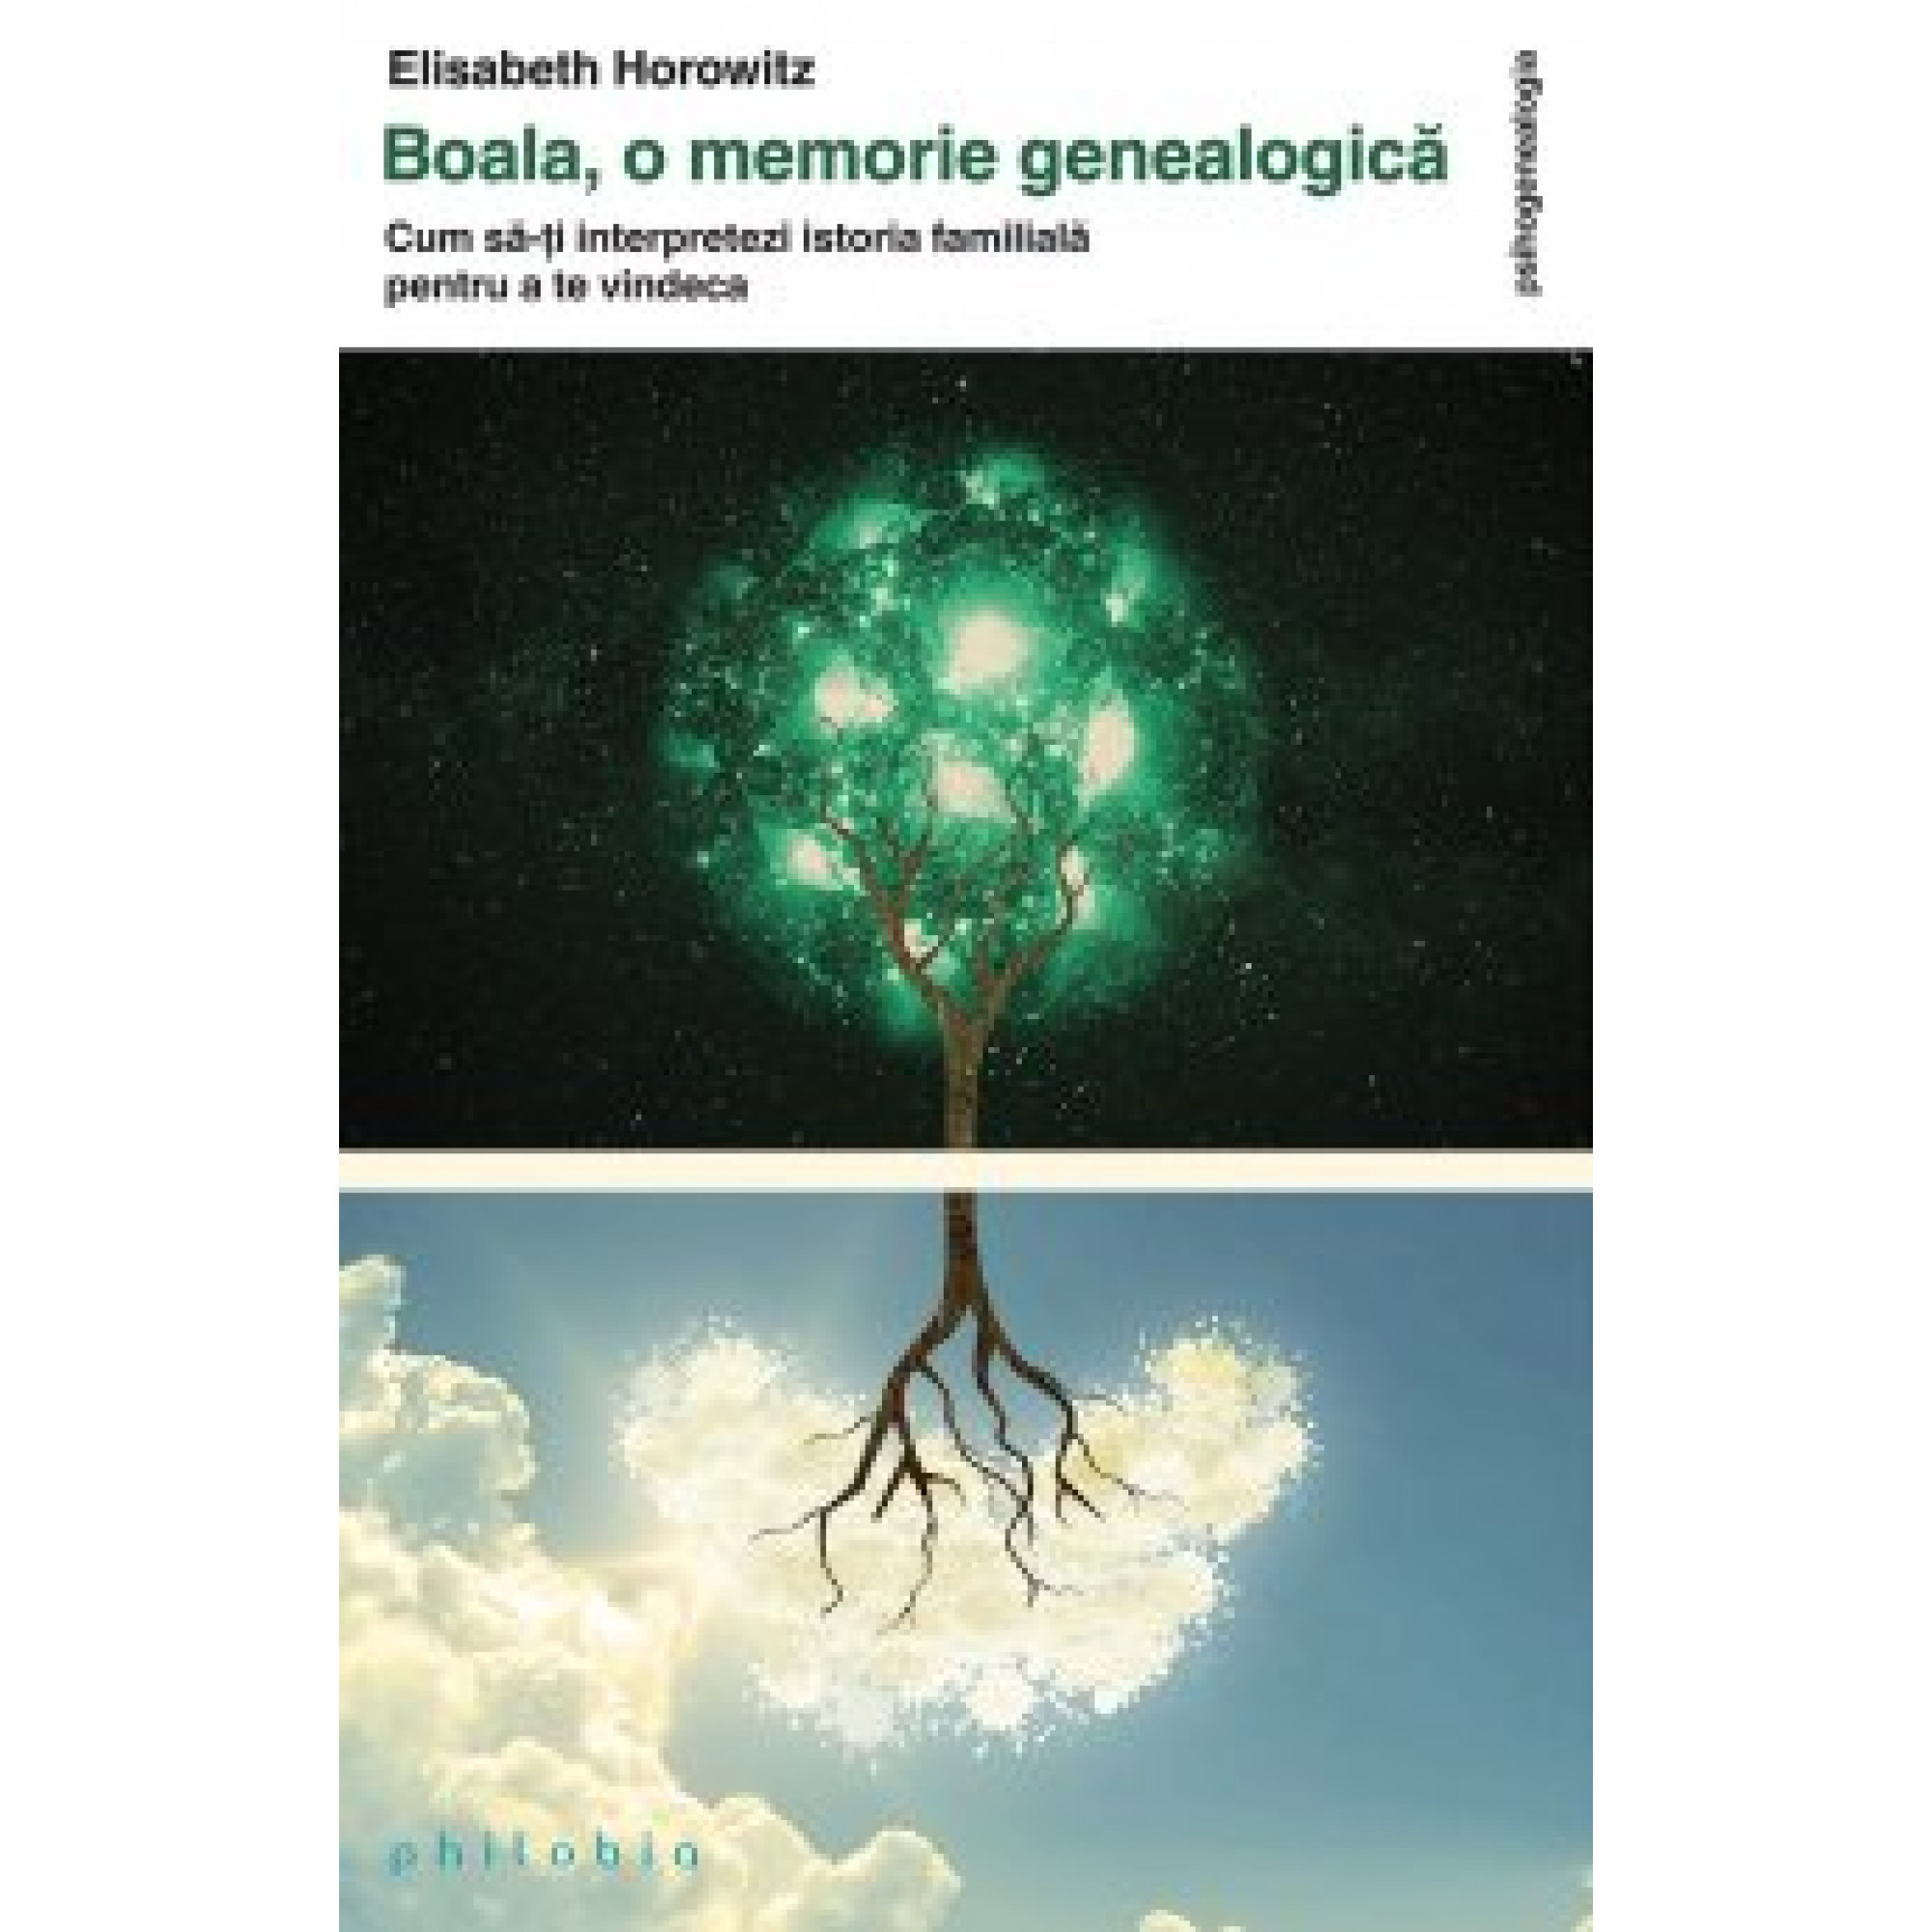 Boala, o memorie genealogică; Elisabeth Horowitz